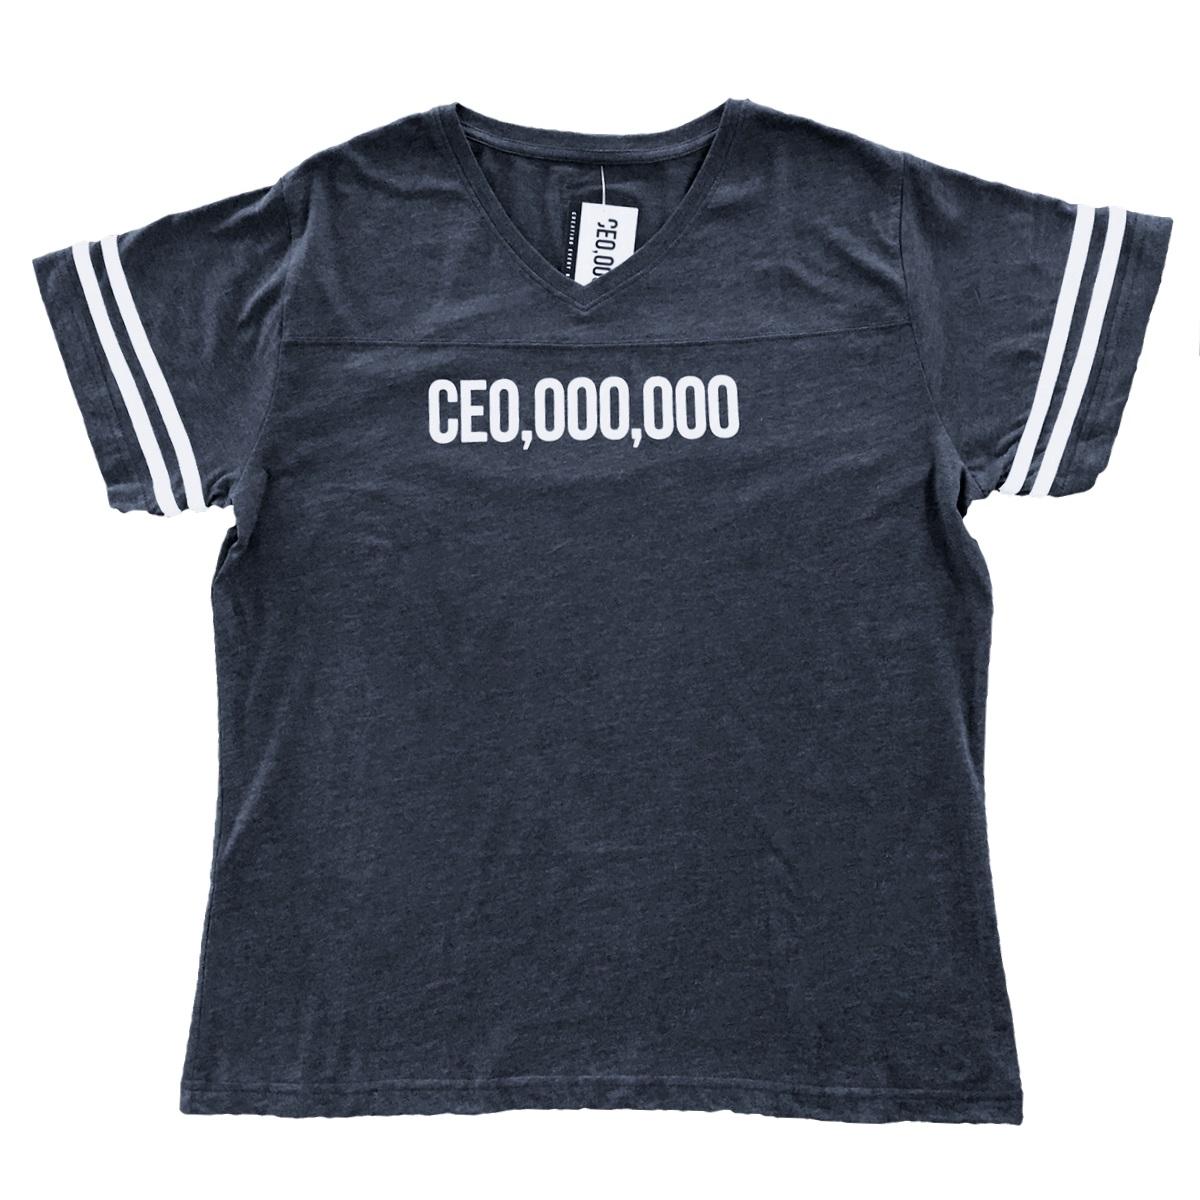 $CE0,000,000 Football T-Shirt [Heather Navy]